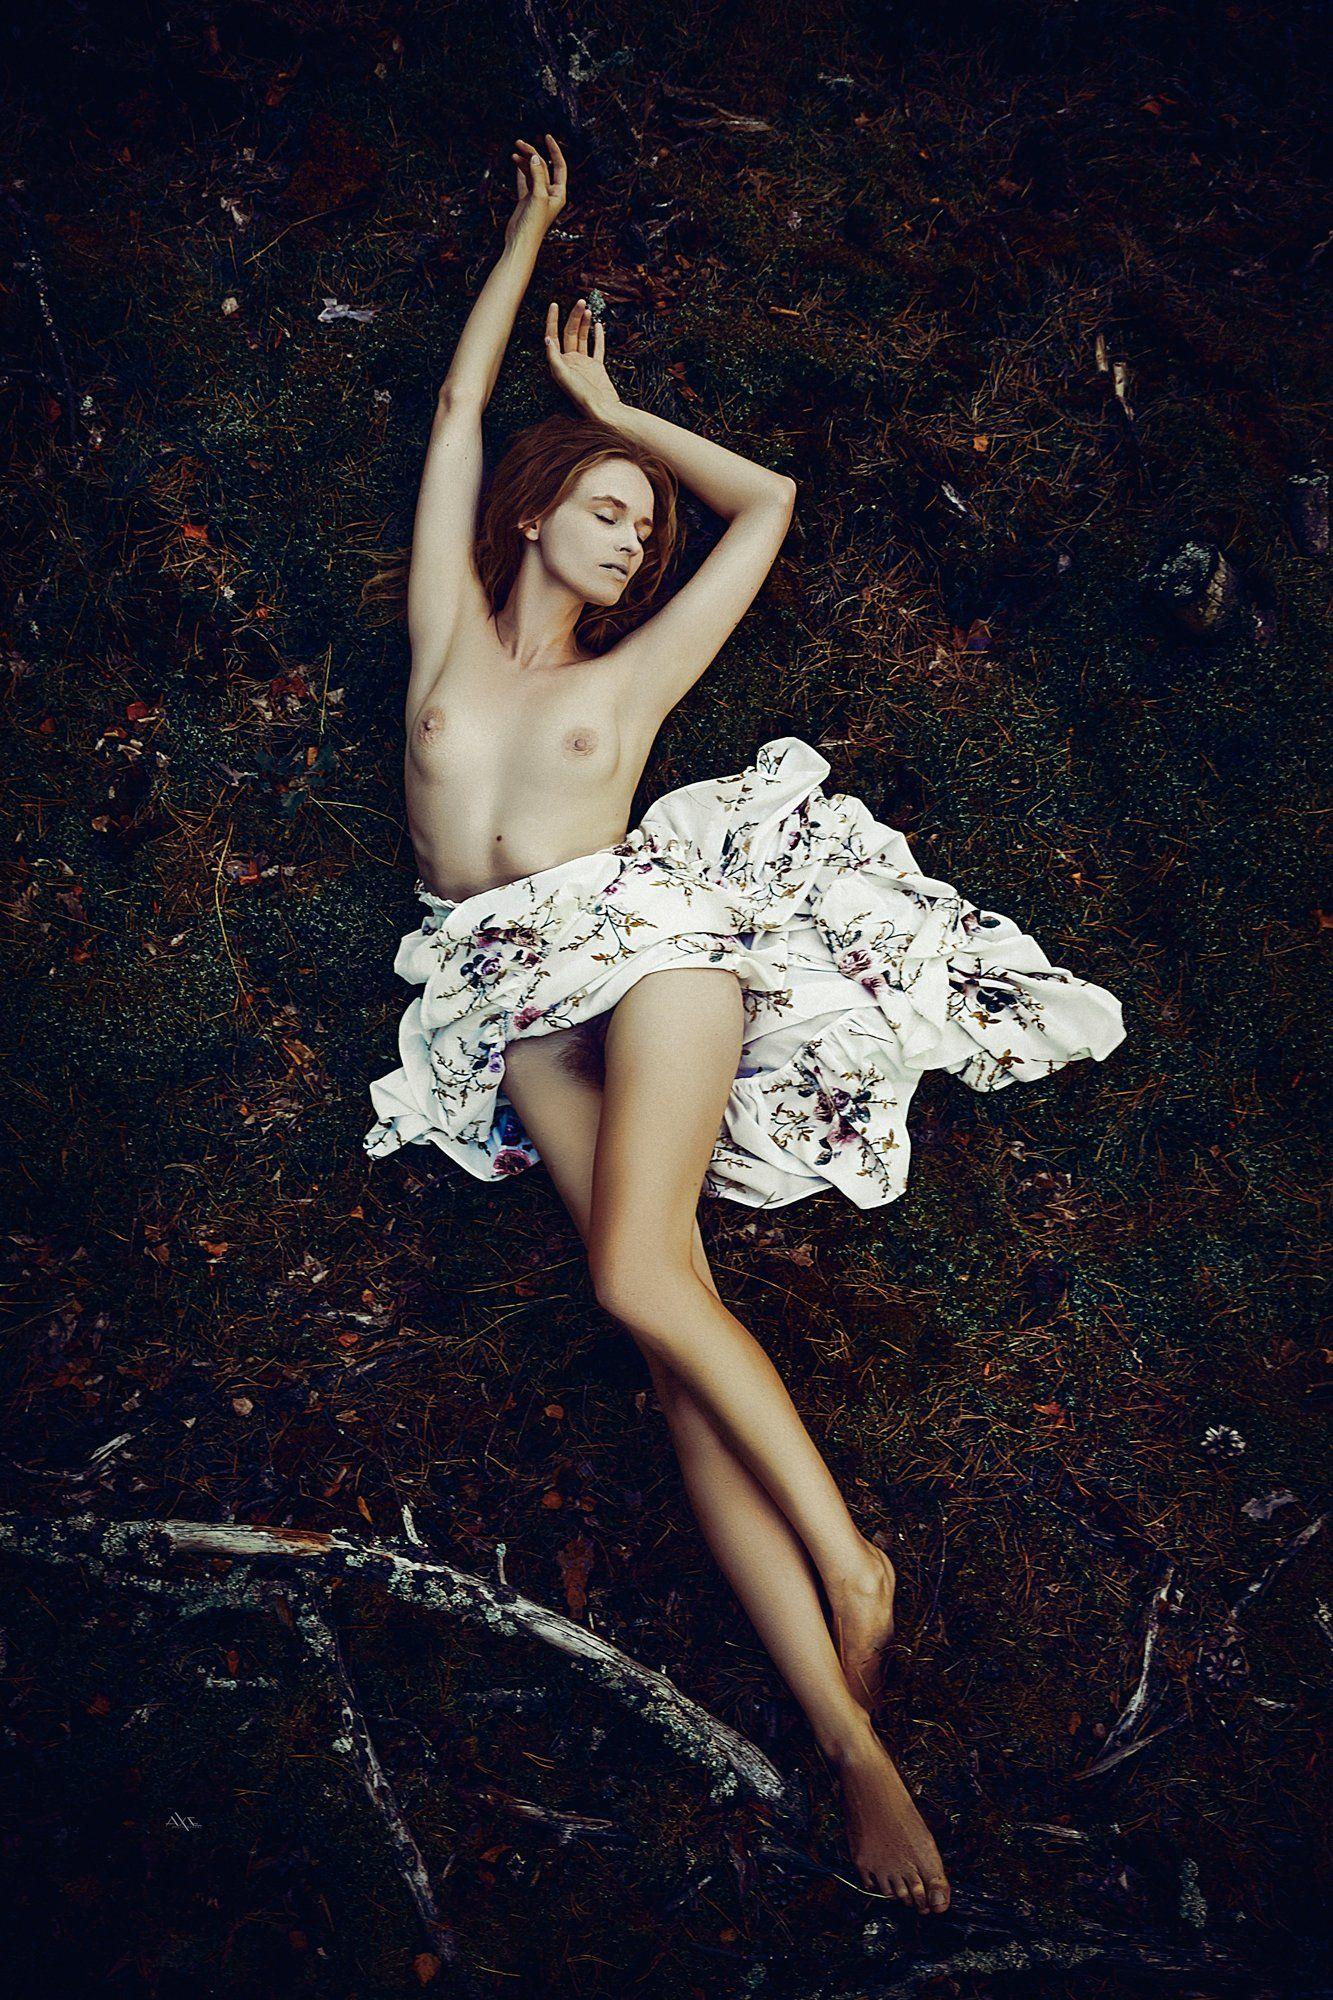 woman, portrait, nude, outdoors, naturallight, Руслан Болгов (Axe)